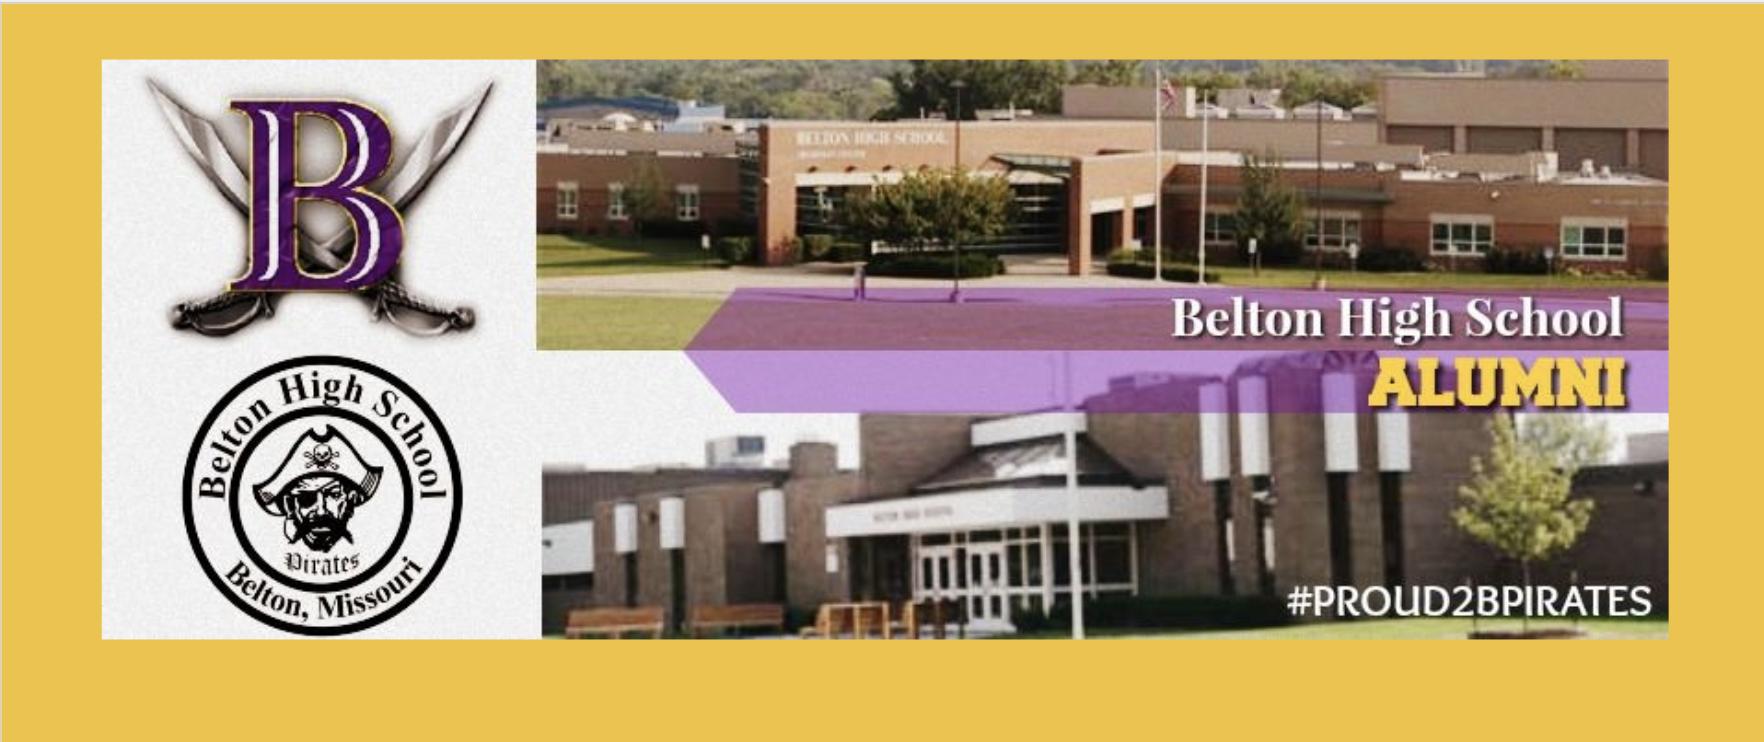 2021 Belton High School All Class Reunion Events image